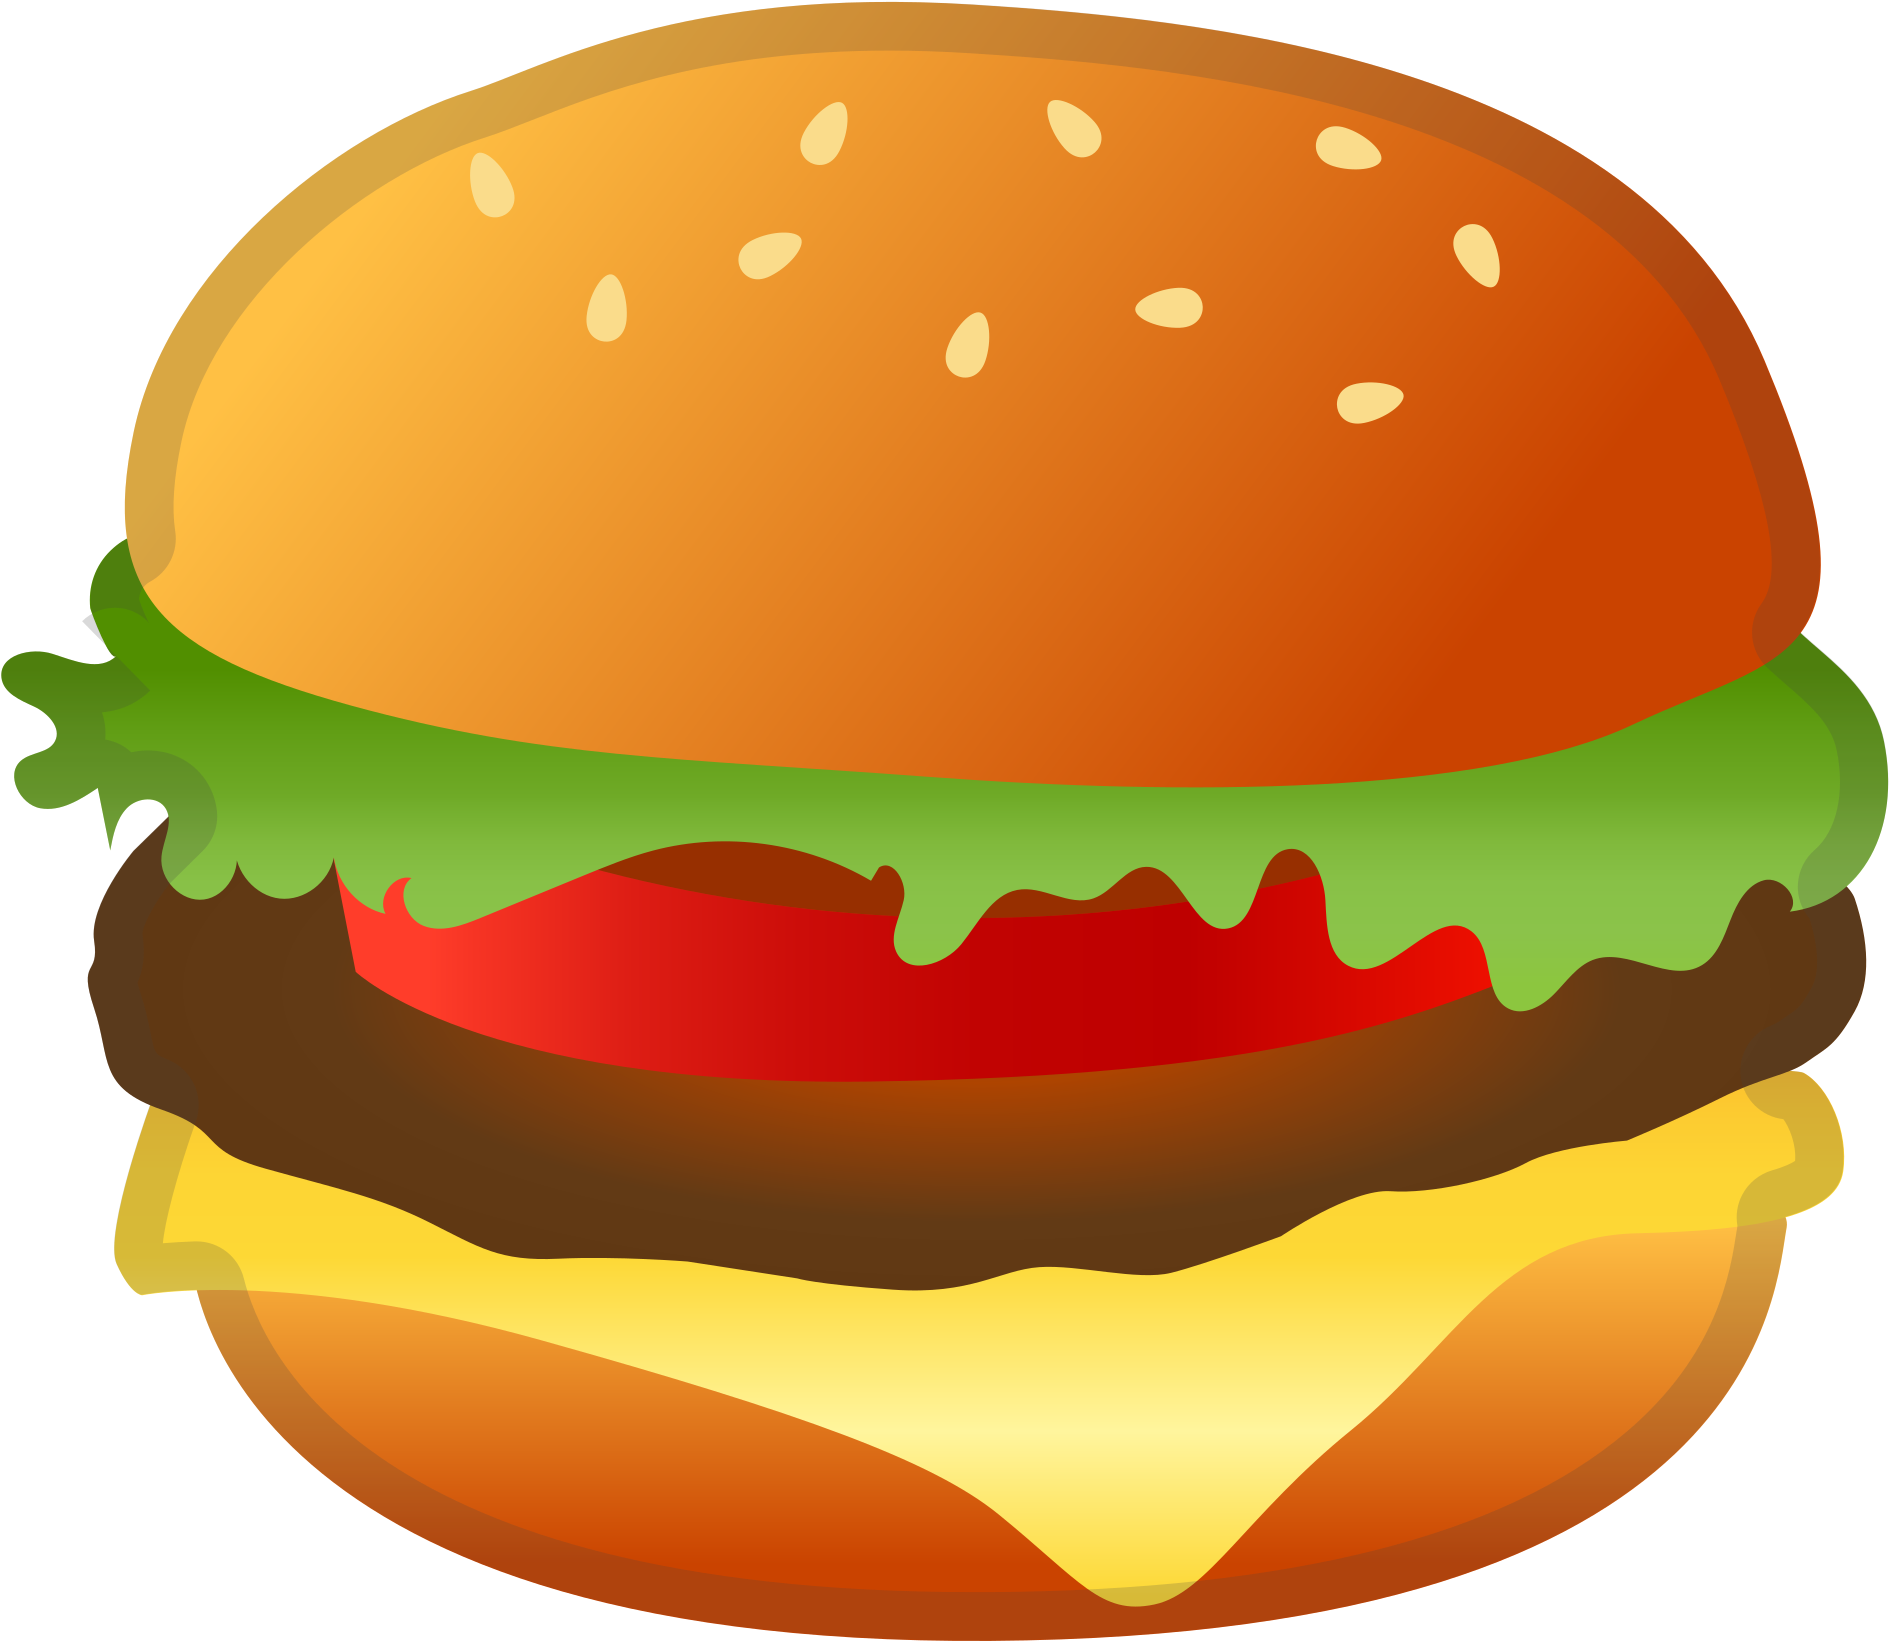 Free transparent download clip. Cheeseburger clipart